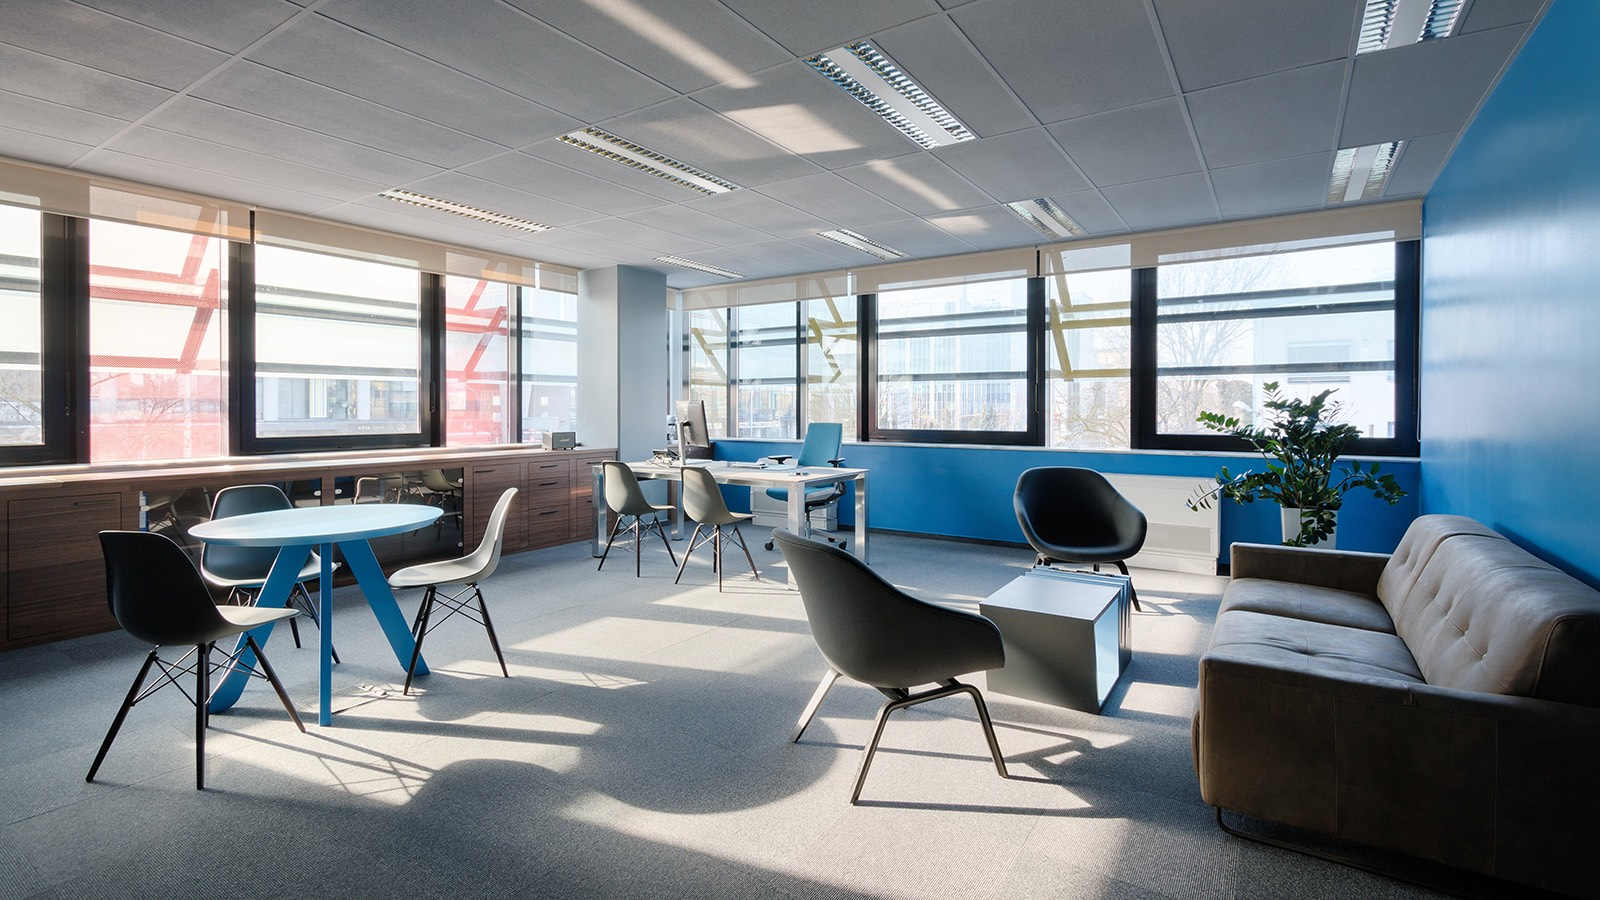 A tour of nanobit s cool new zagreb office officelovin 39 for Design office zagreb